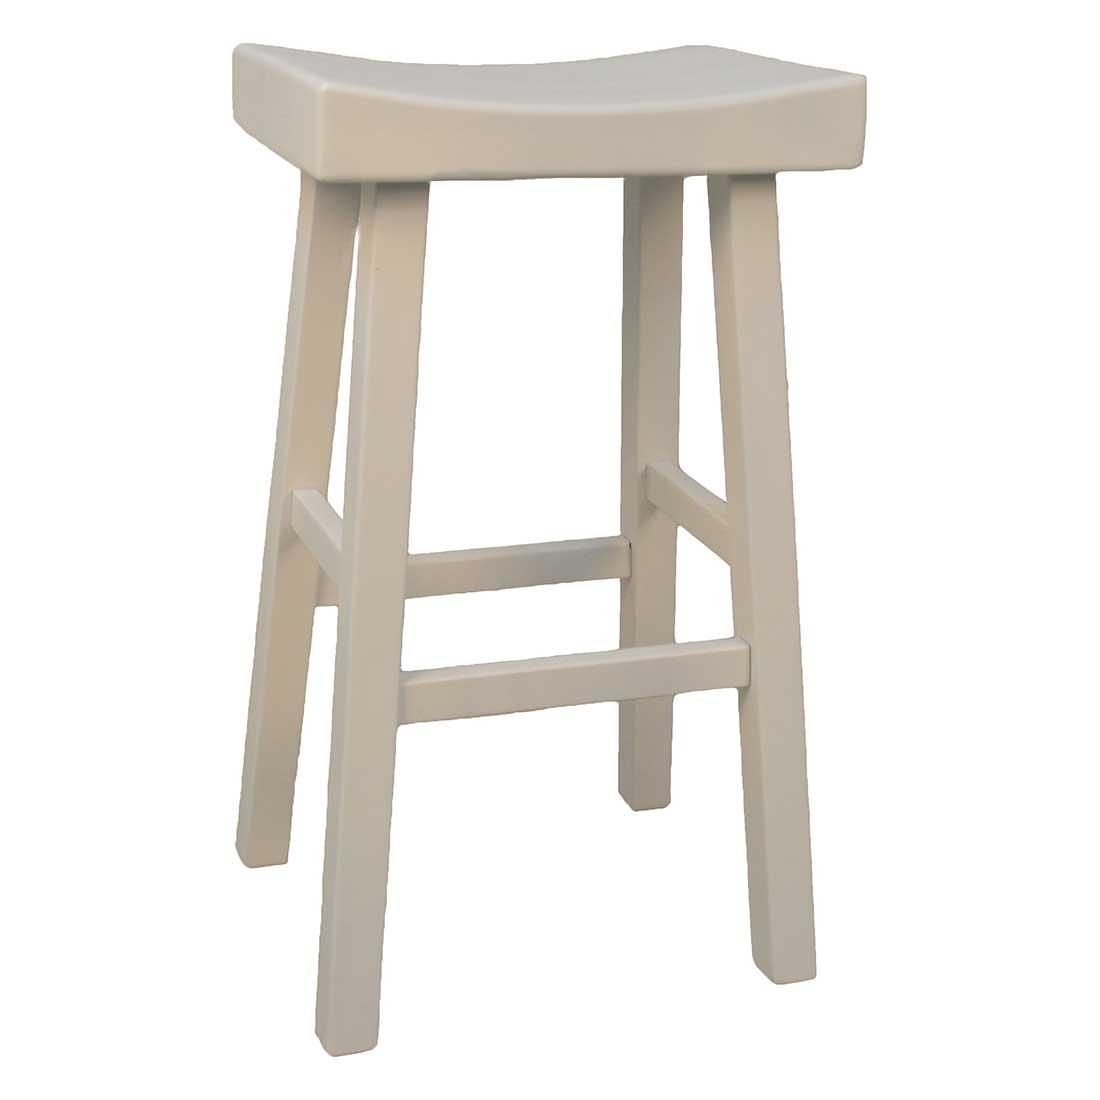 Marvelous Naomi Saddle Seat Bar Stool Beatyapartments Chair Design Images Beatyapartmentscom